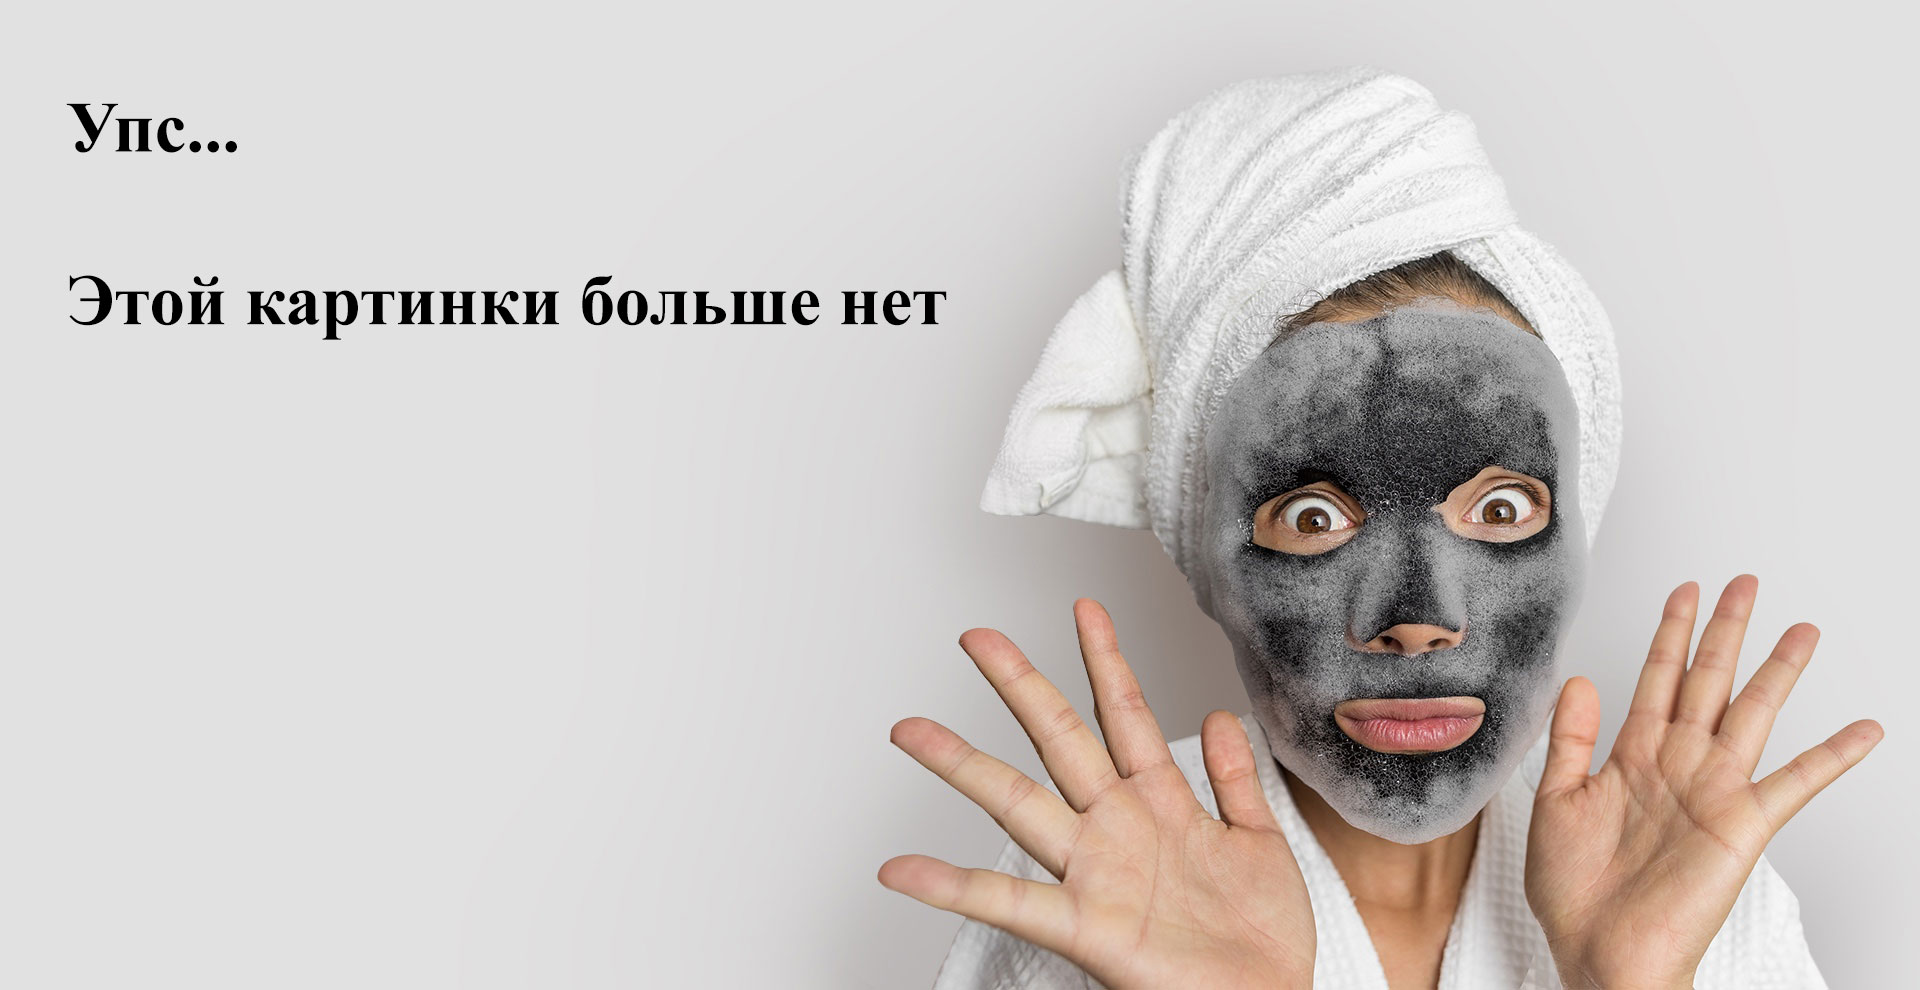 Estel, Оксигент 3% De Luxe, для окрашивания волос, 60 мл